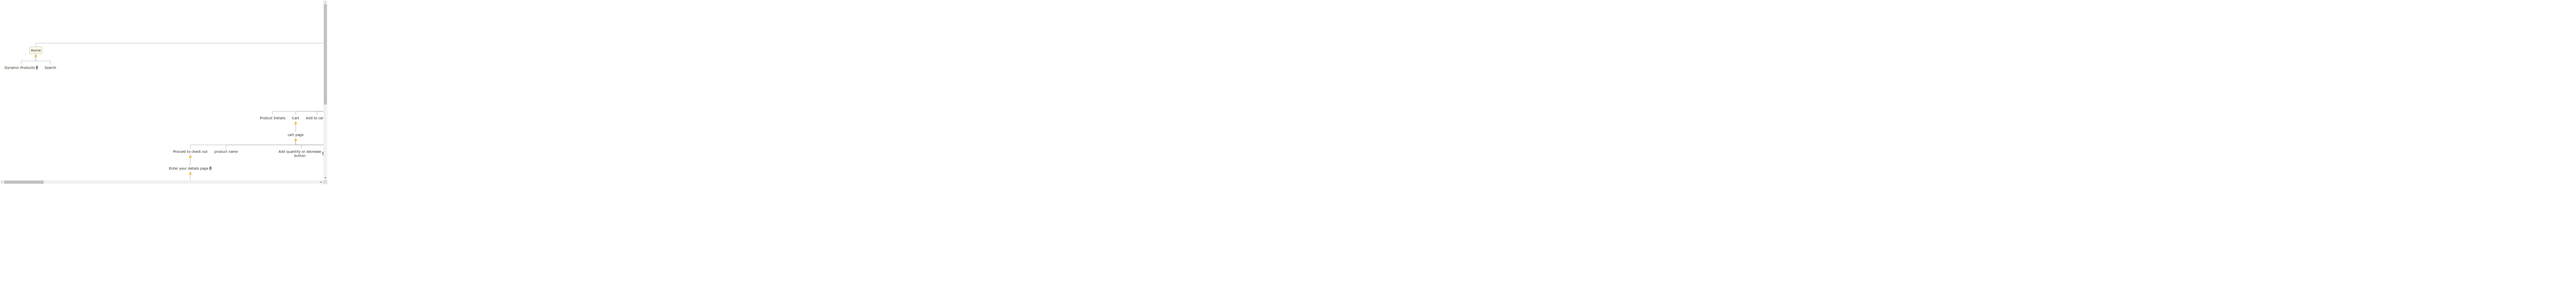 Cross Platform Application1 Mind Map